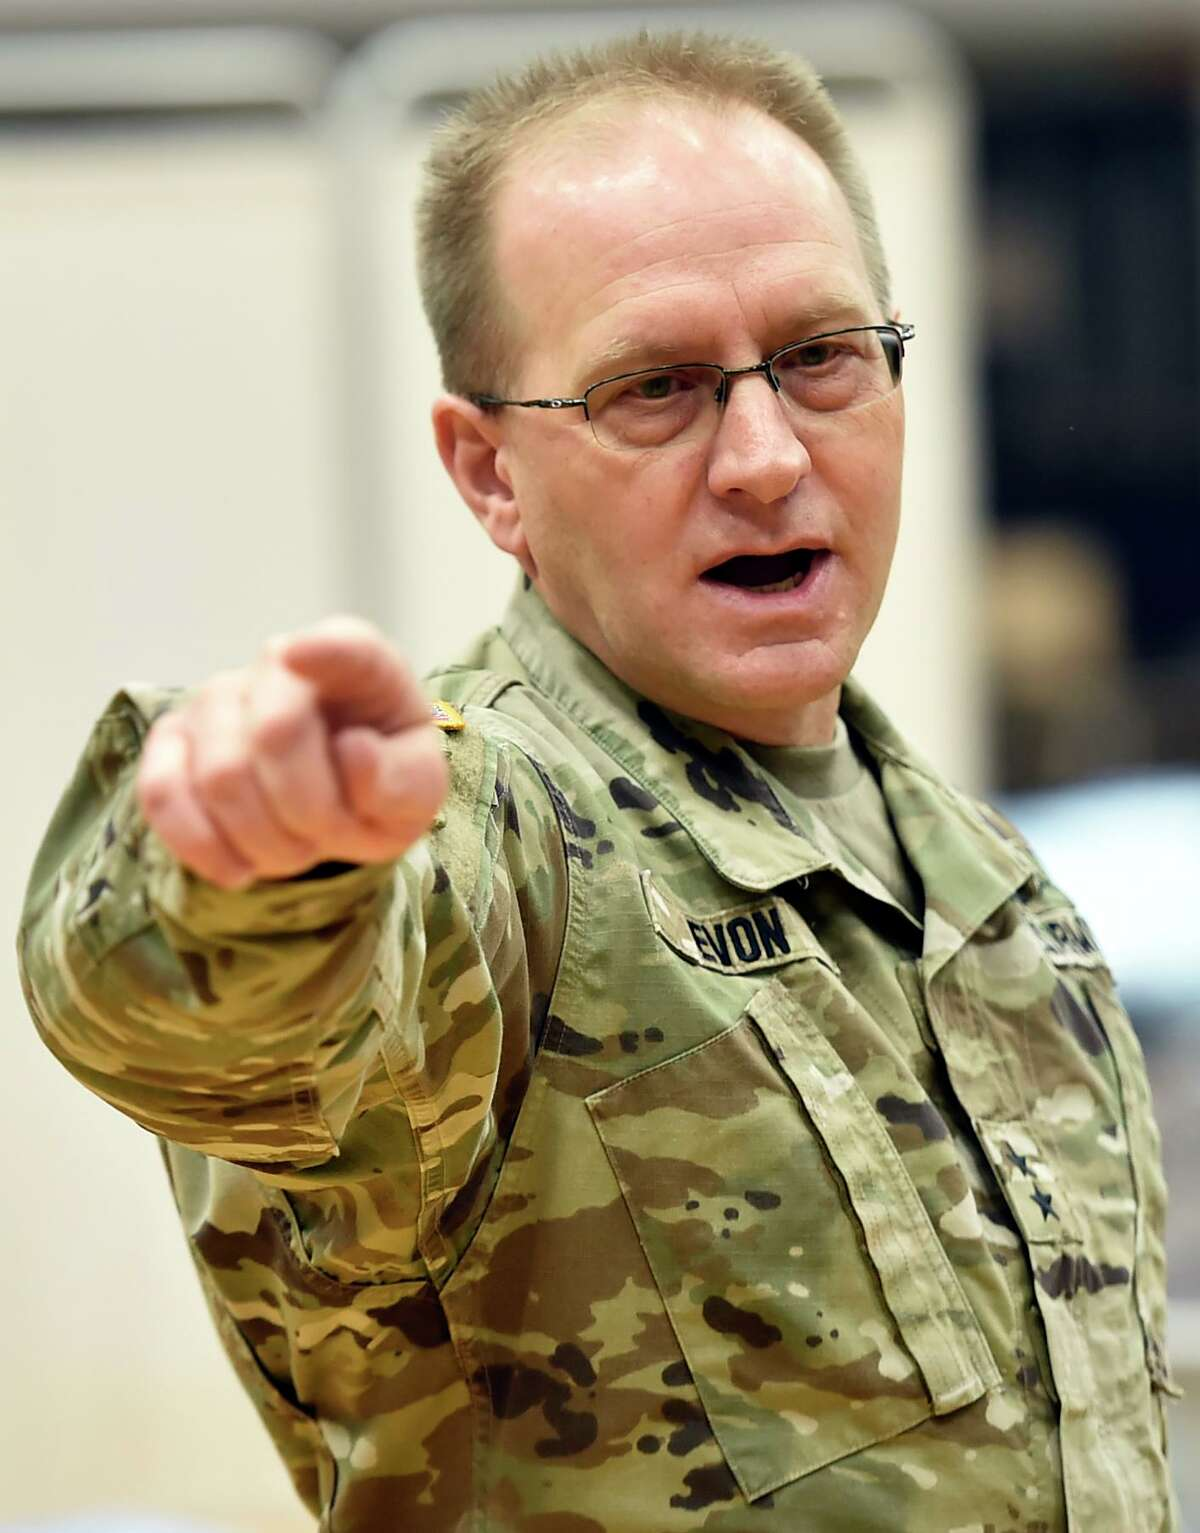 Major General Francis Evon, the Connecticut National Guard's adjutant general